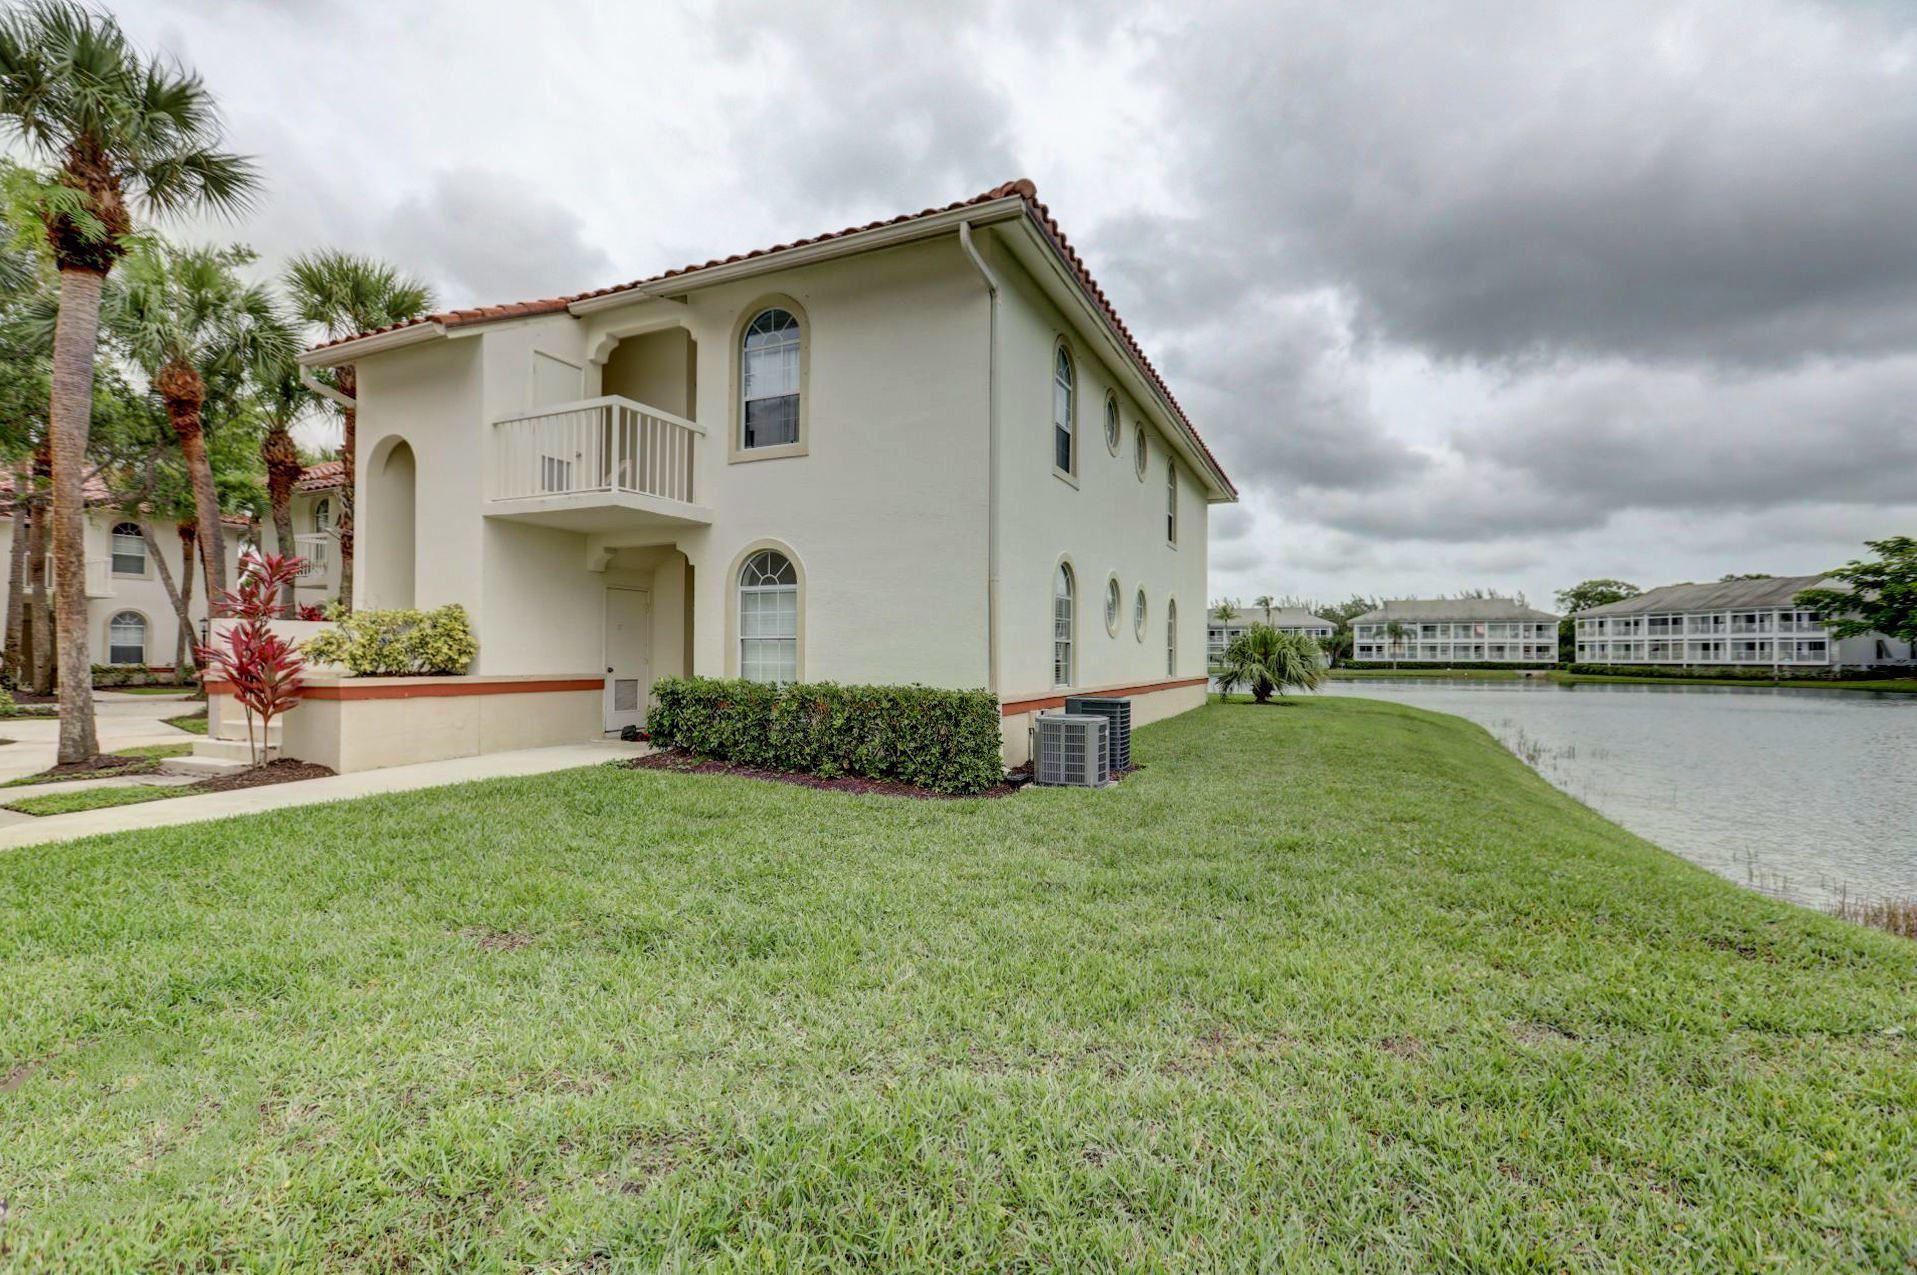 Photo of 220 Cypress Point Drive, Palm Beach Gardens, FL 33418 (MLS # RX-10626839)